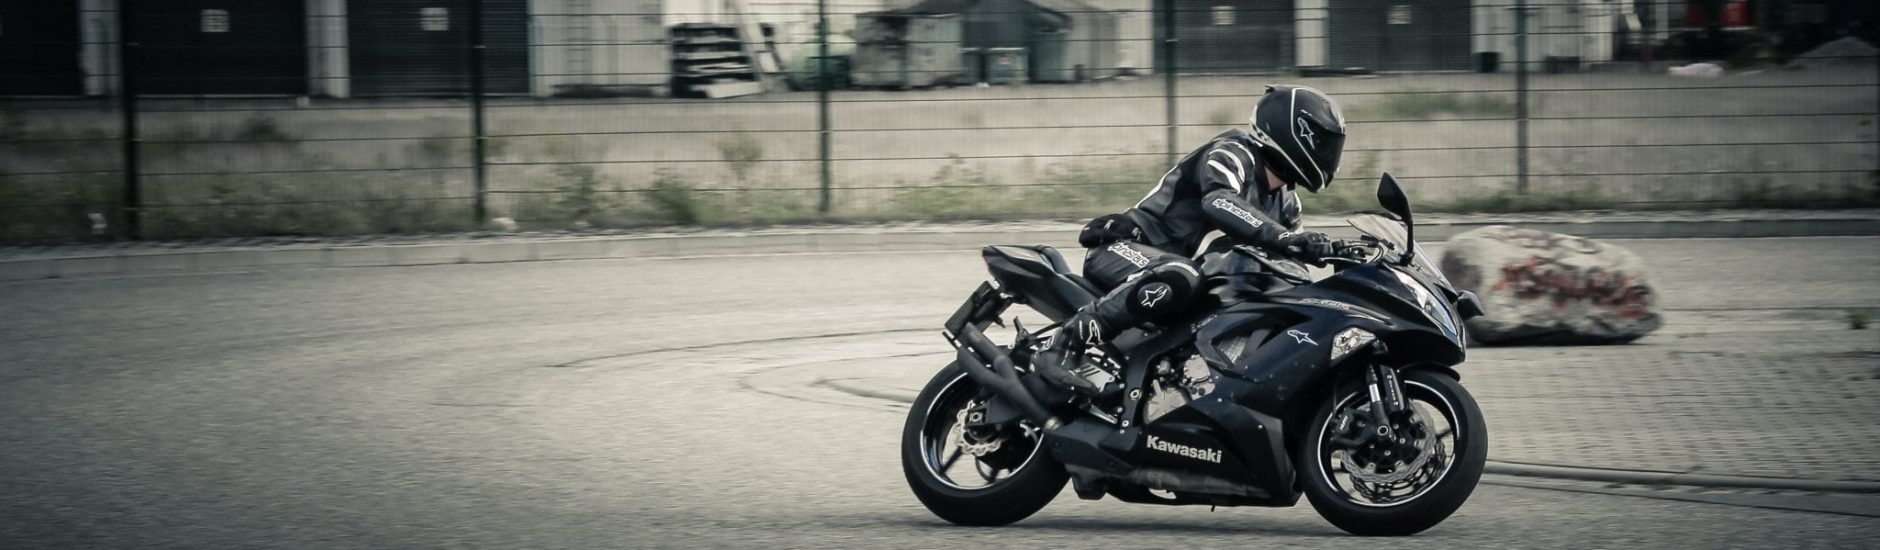 Sedgemoor Motorcycle Training, Bridgwater, Somerset